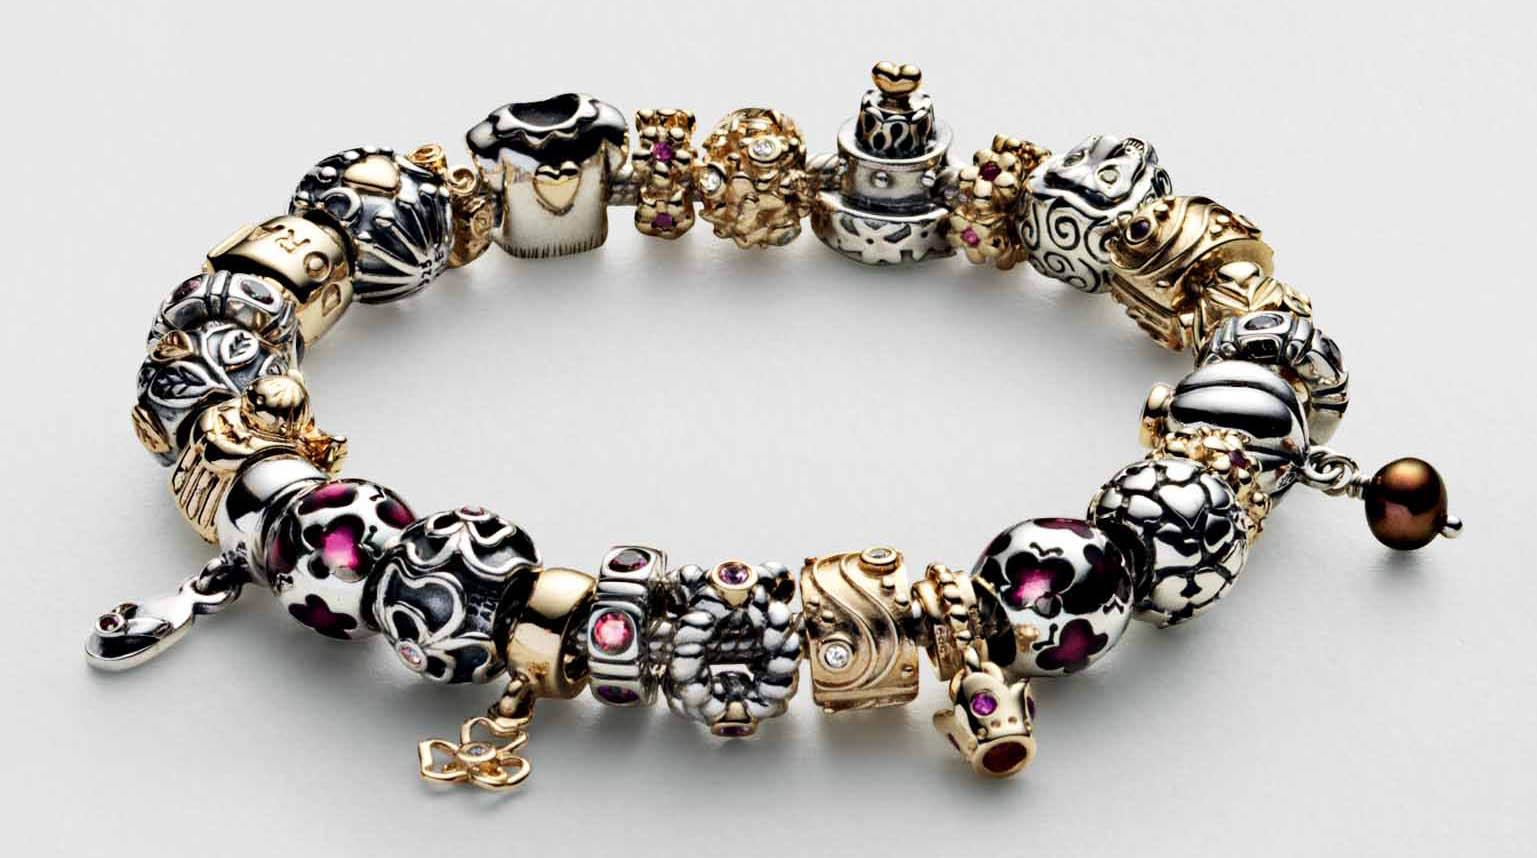 Diamonds Aren't Forever, Pandora Jewelery Is